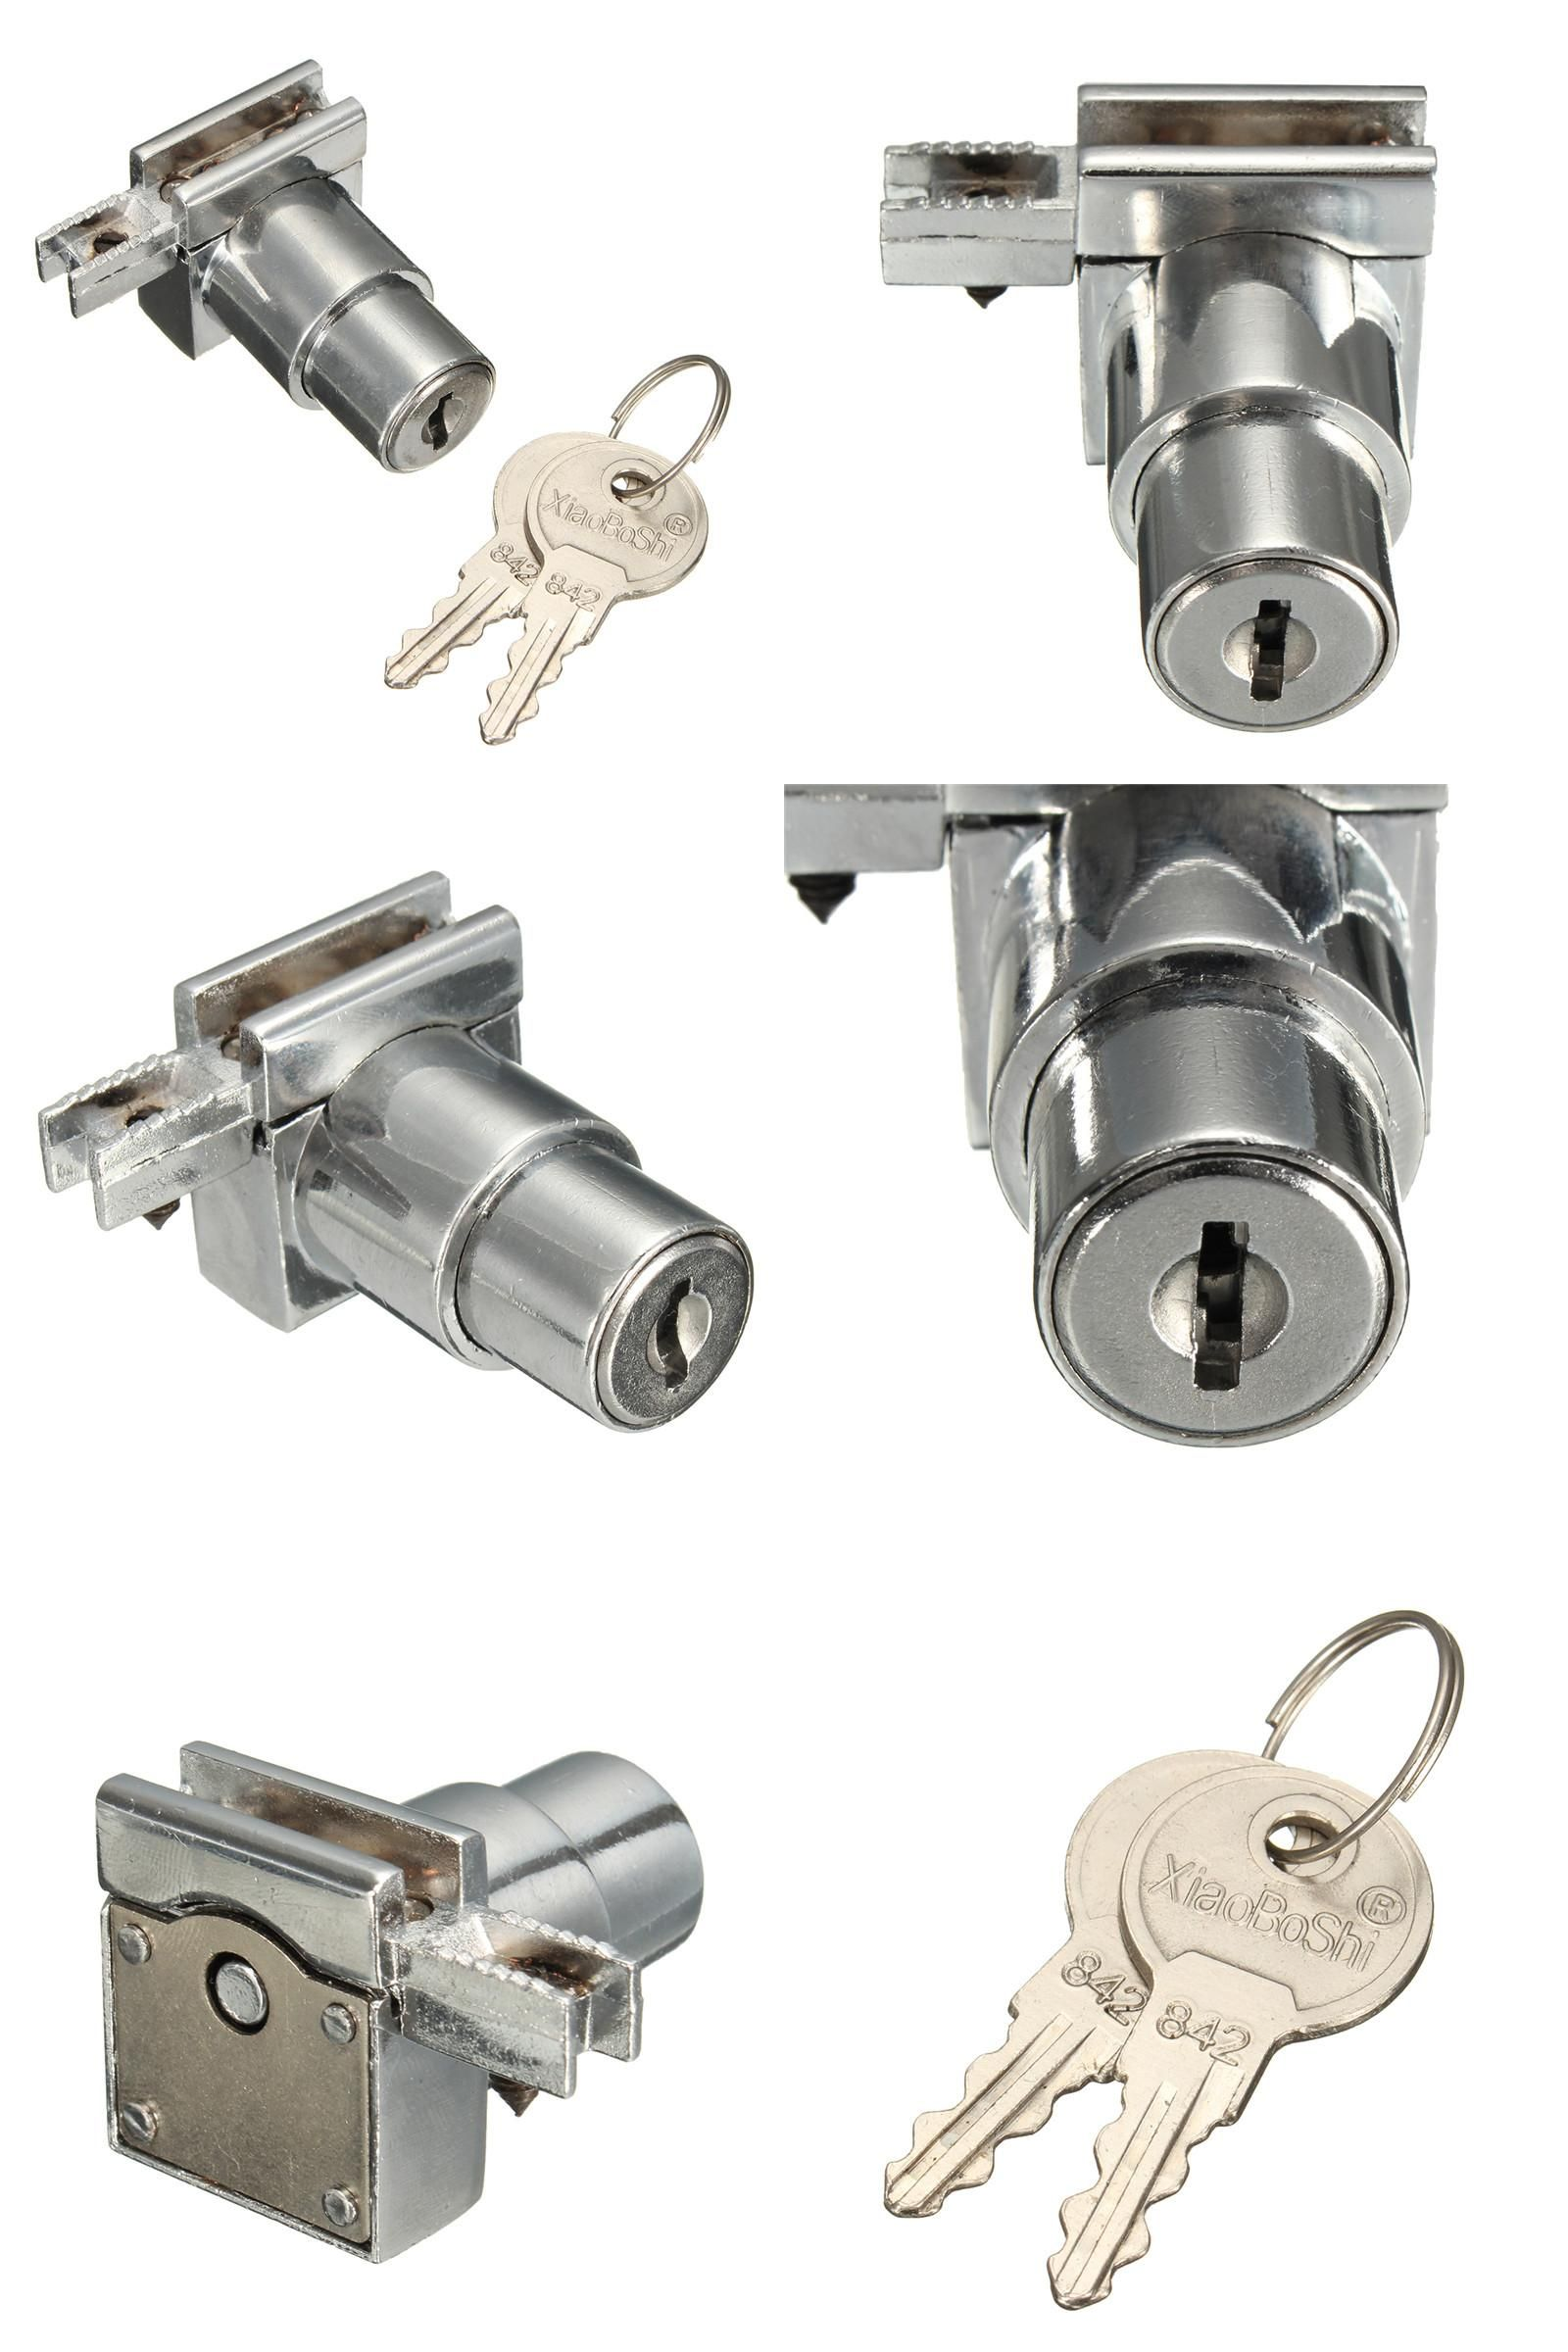 Visit To Buy Plunger Push Lock With 2 Key For Sliding Glass Door Showcase Lock Furniture Cabinet Lock 5mm Sliding Glass Door Cabinet Furniture Cabinet Locks